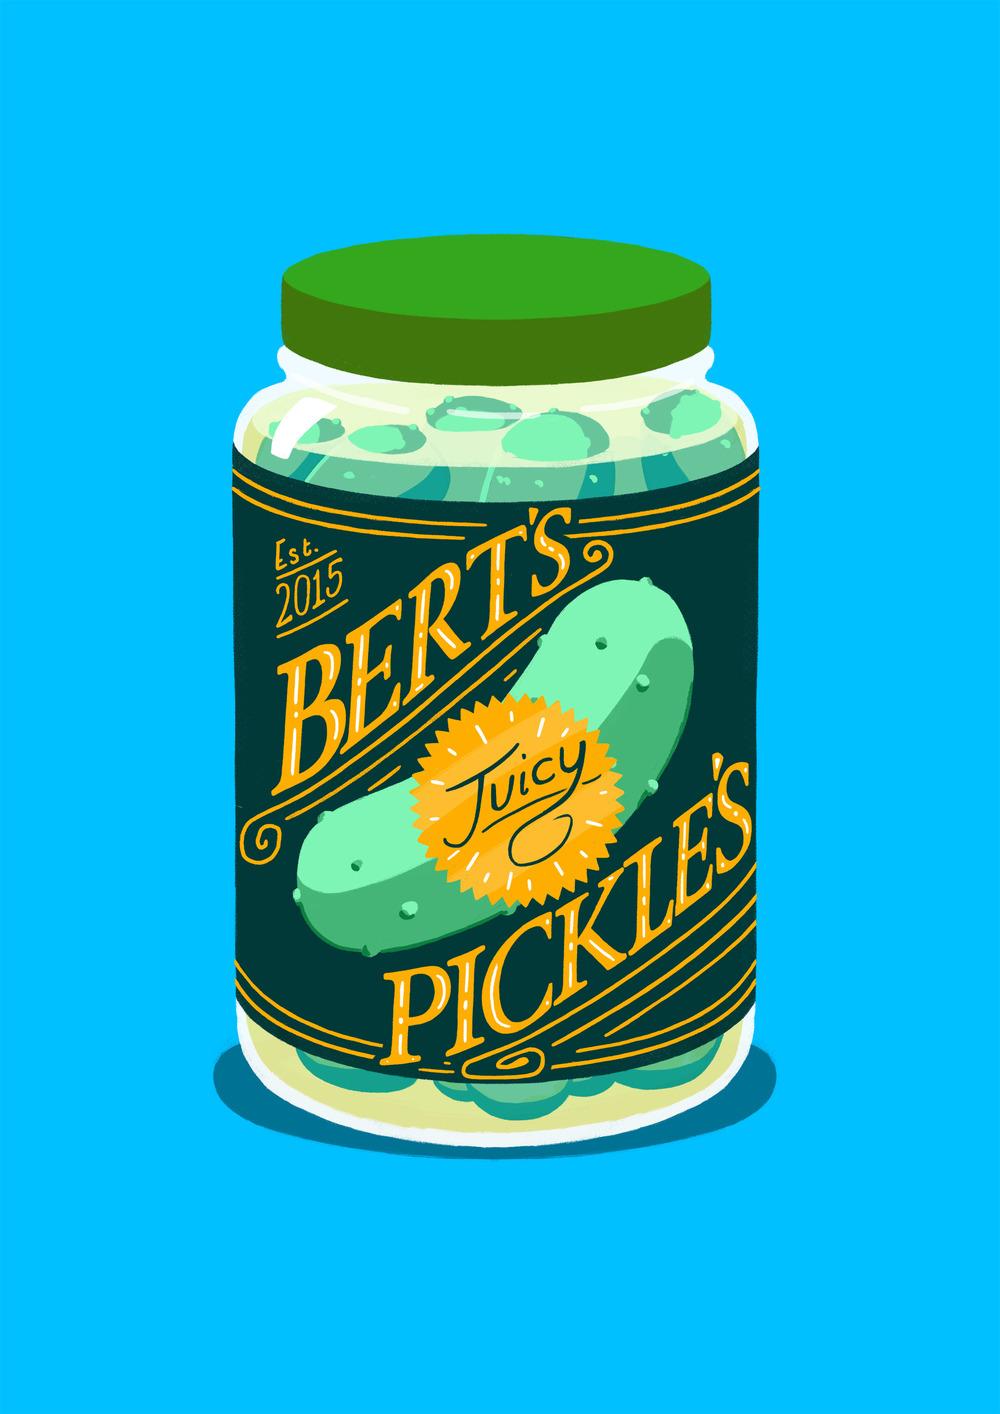 Bert's Juicy Pickles!